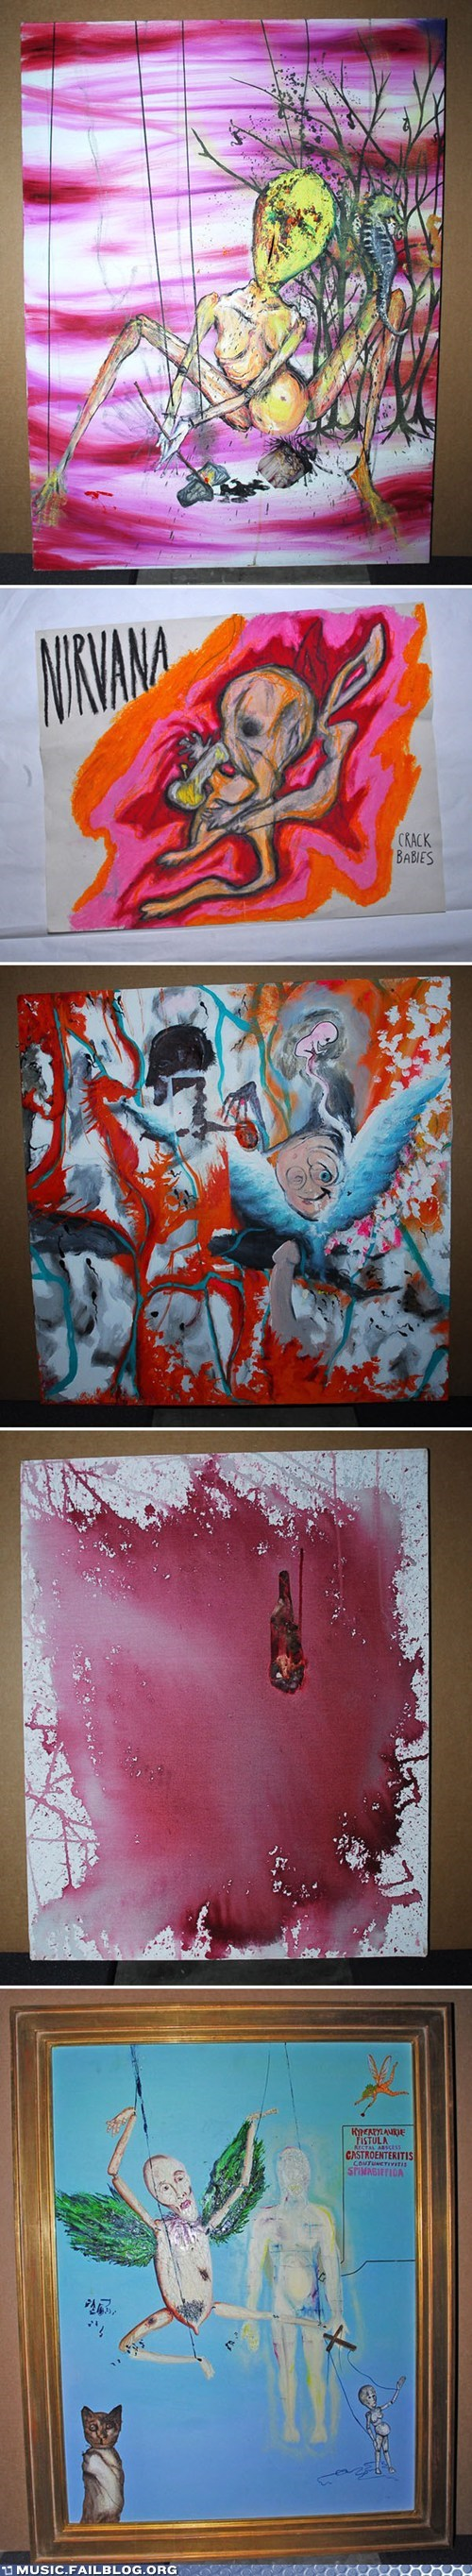 art kurt cobain nirvana - 6065297920